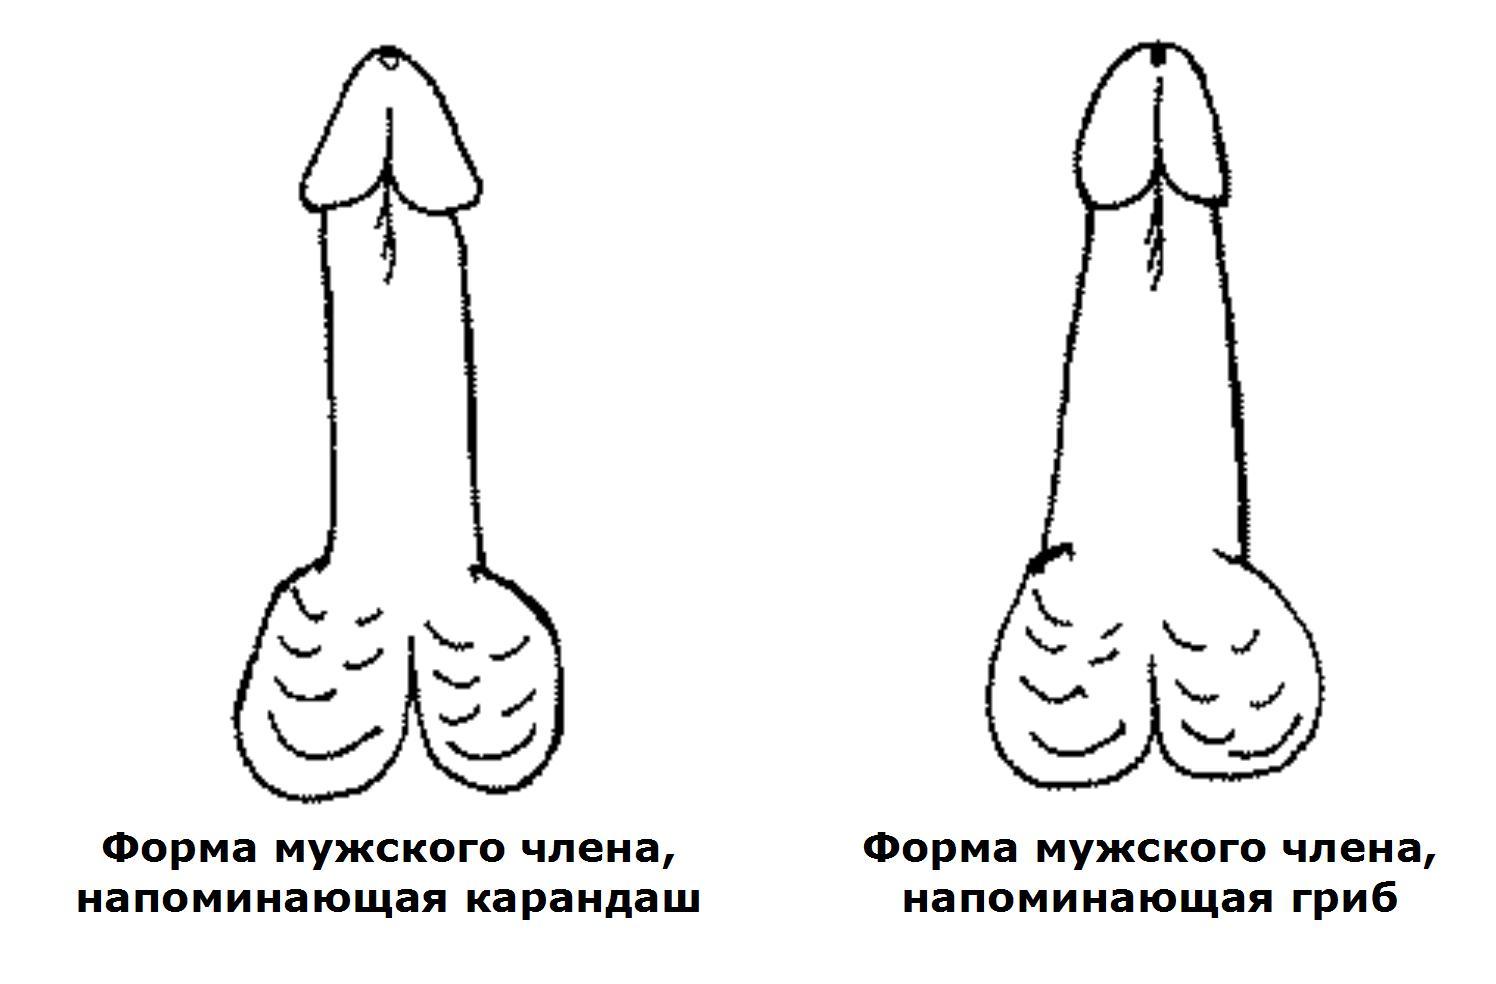 средний размер мужского члена Коммунар